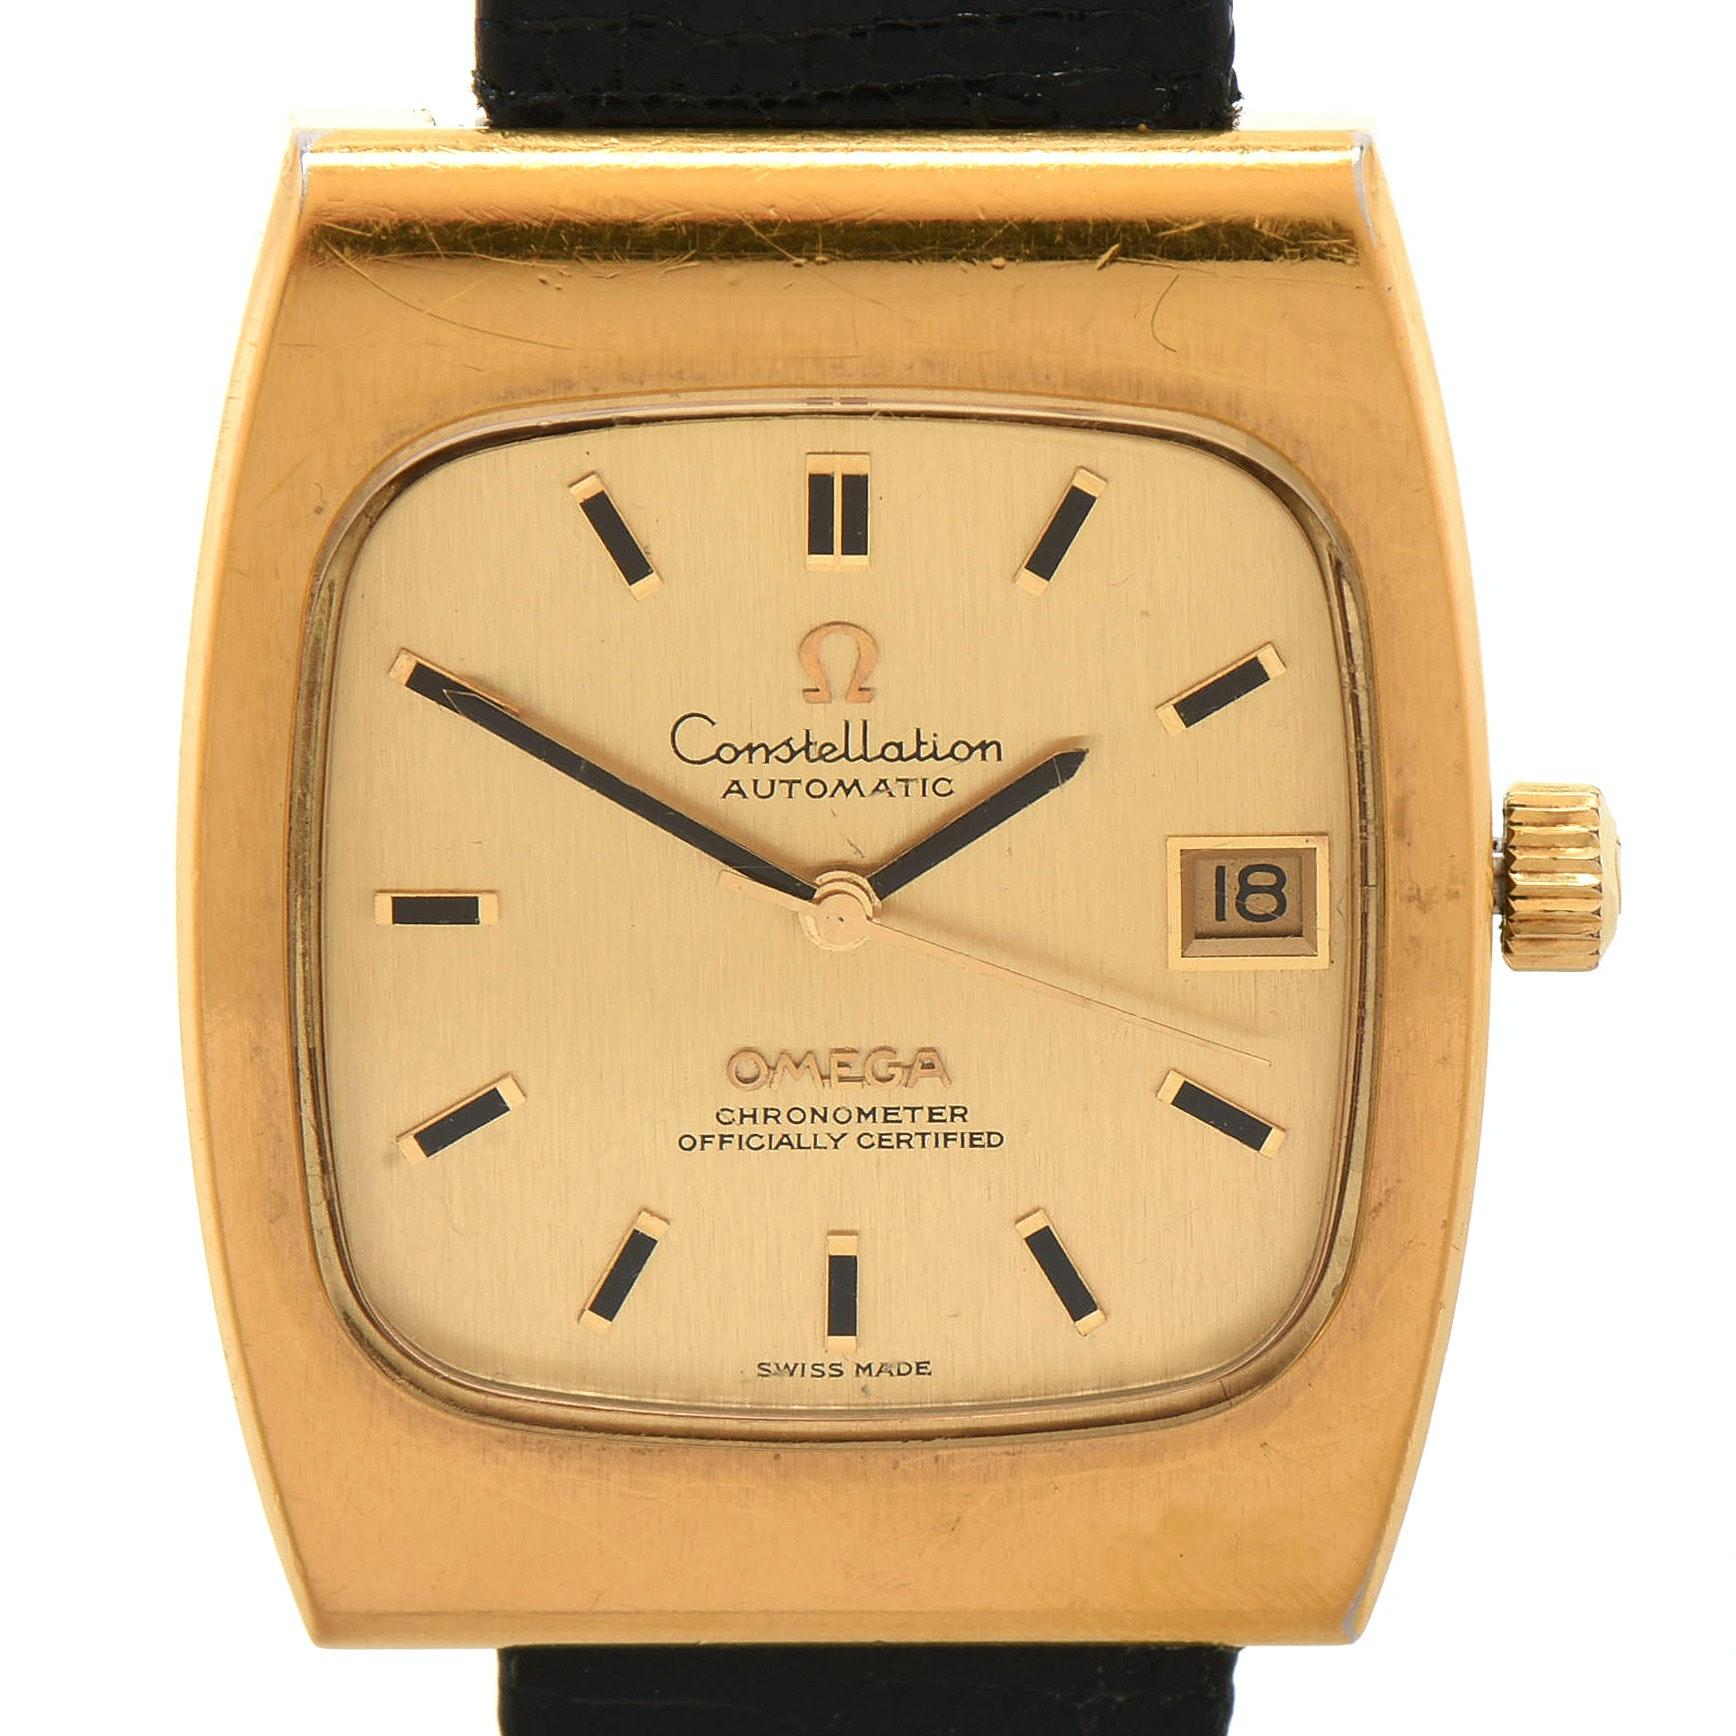 Circa 1970s Omega Constellation Automatic Wristwatch